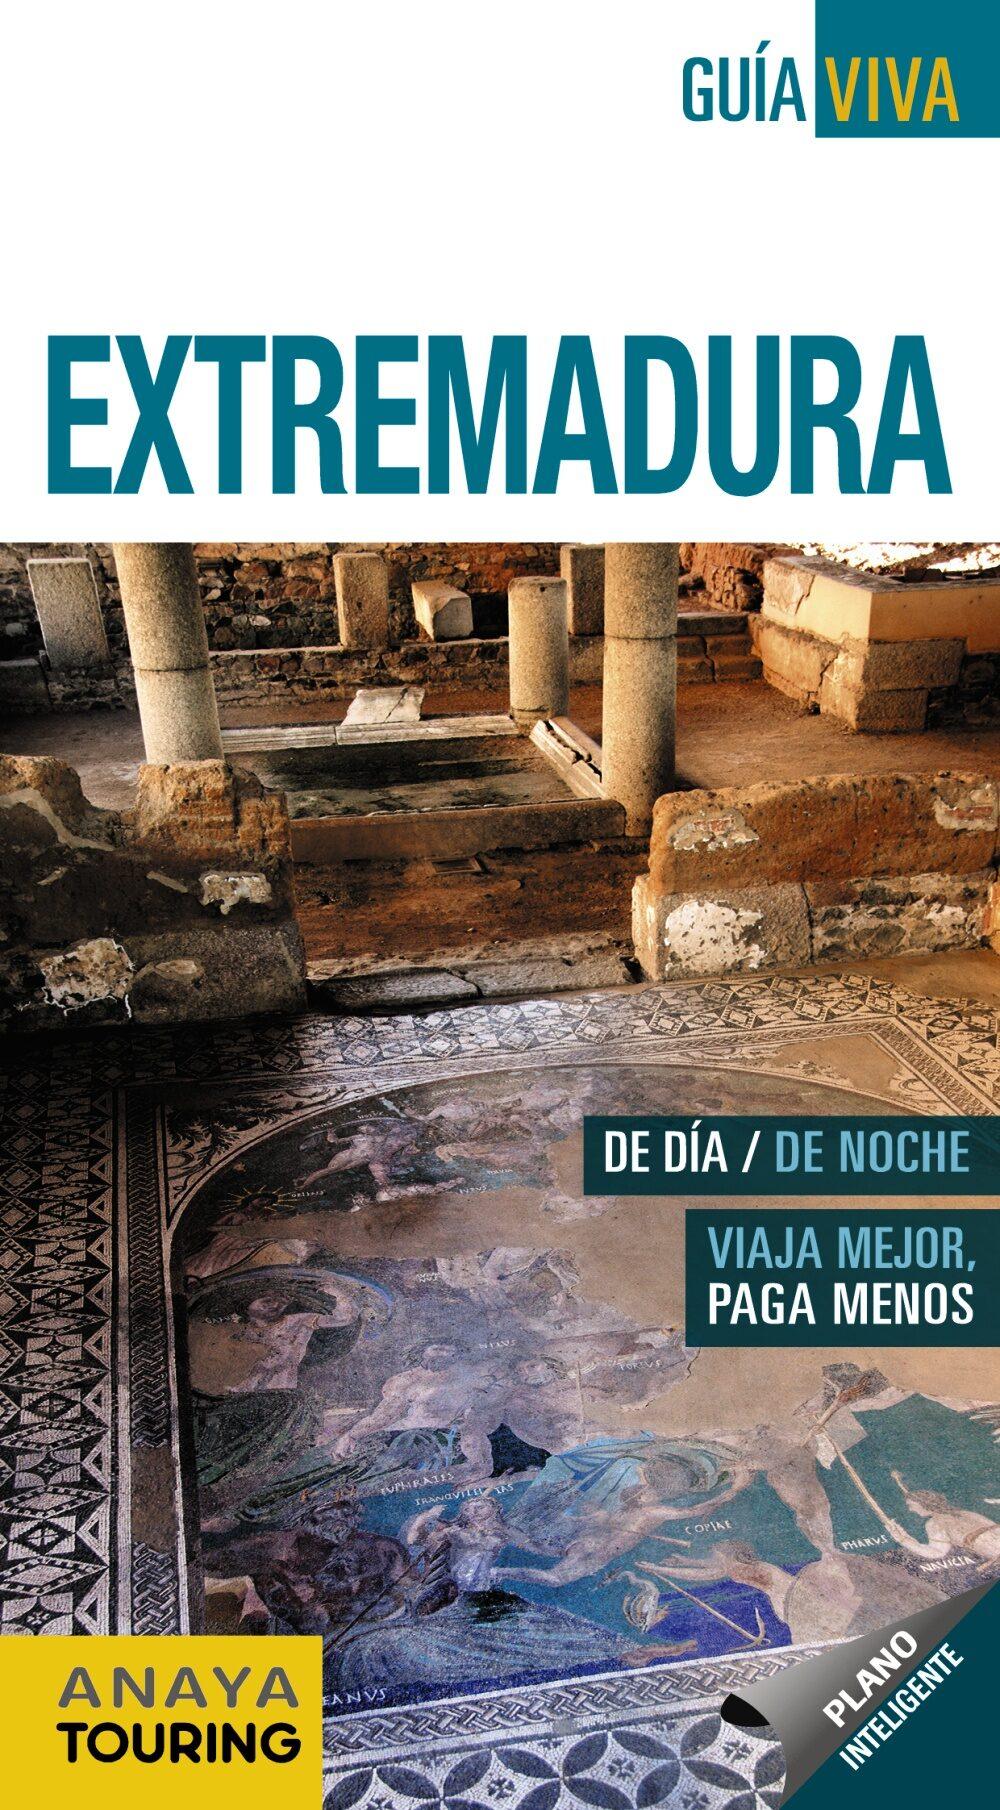 lo esencial de extremadura 2016 (6ª ed.) (guia viva españa)-juan pablo avison martinez-alfredo ramos campos-9788499358611